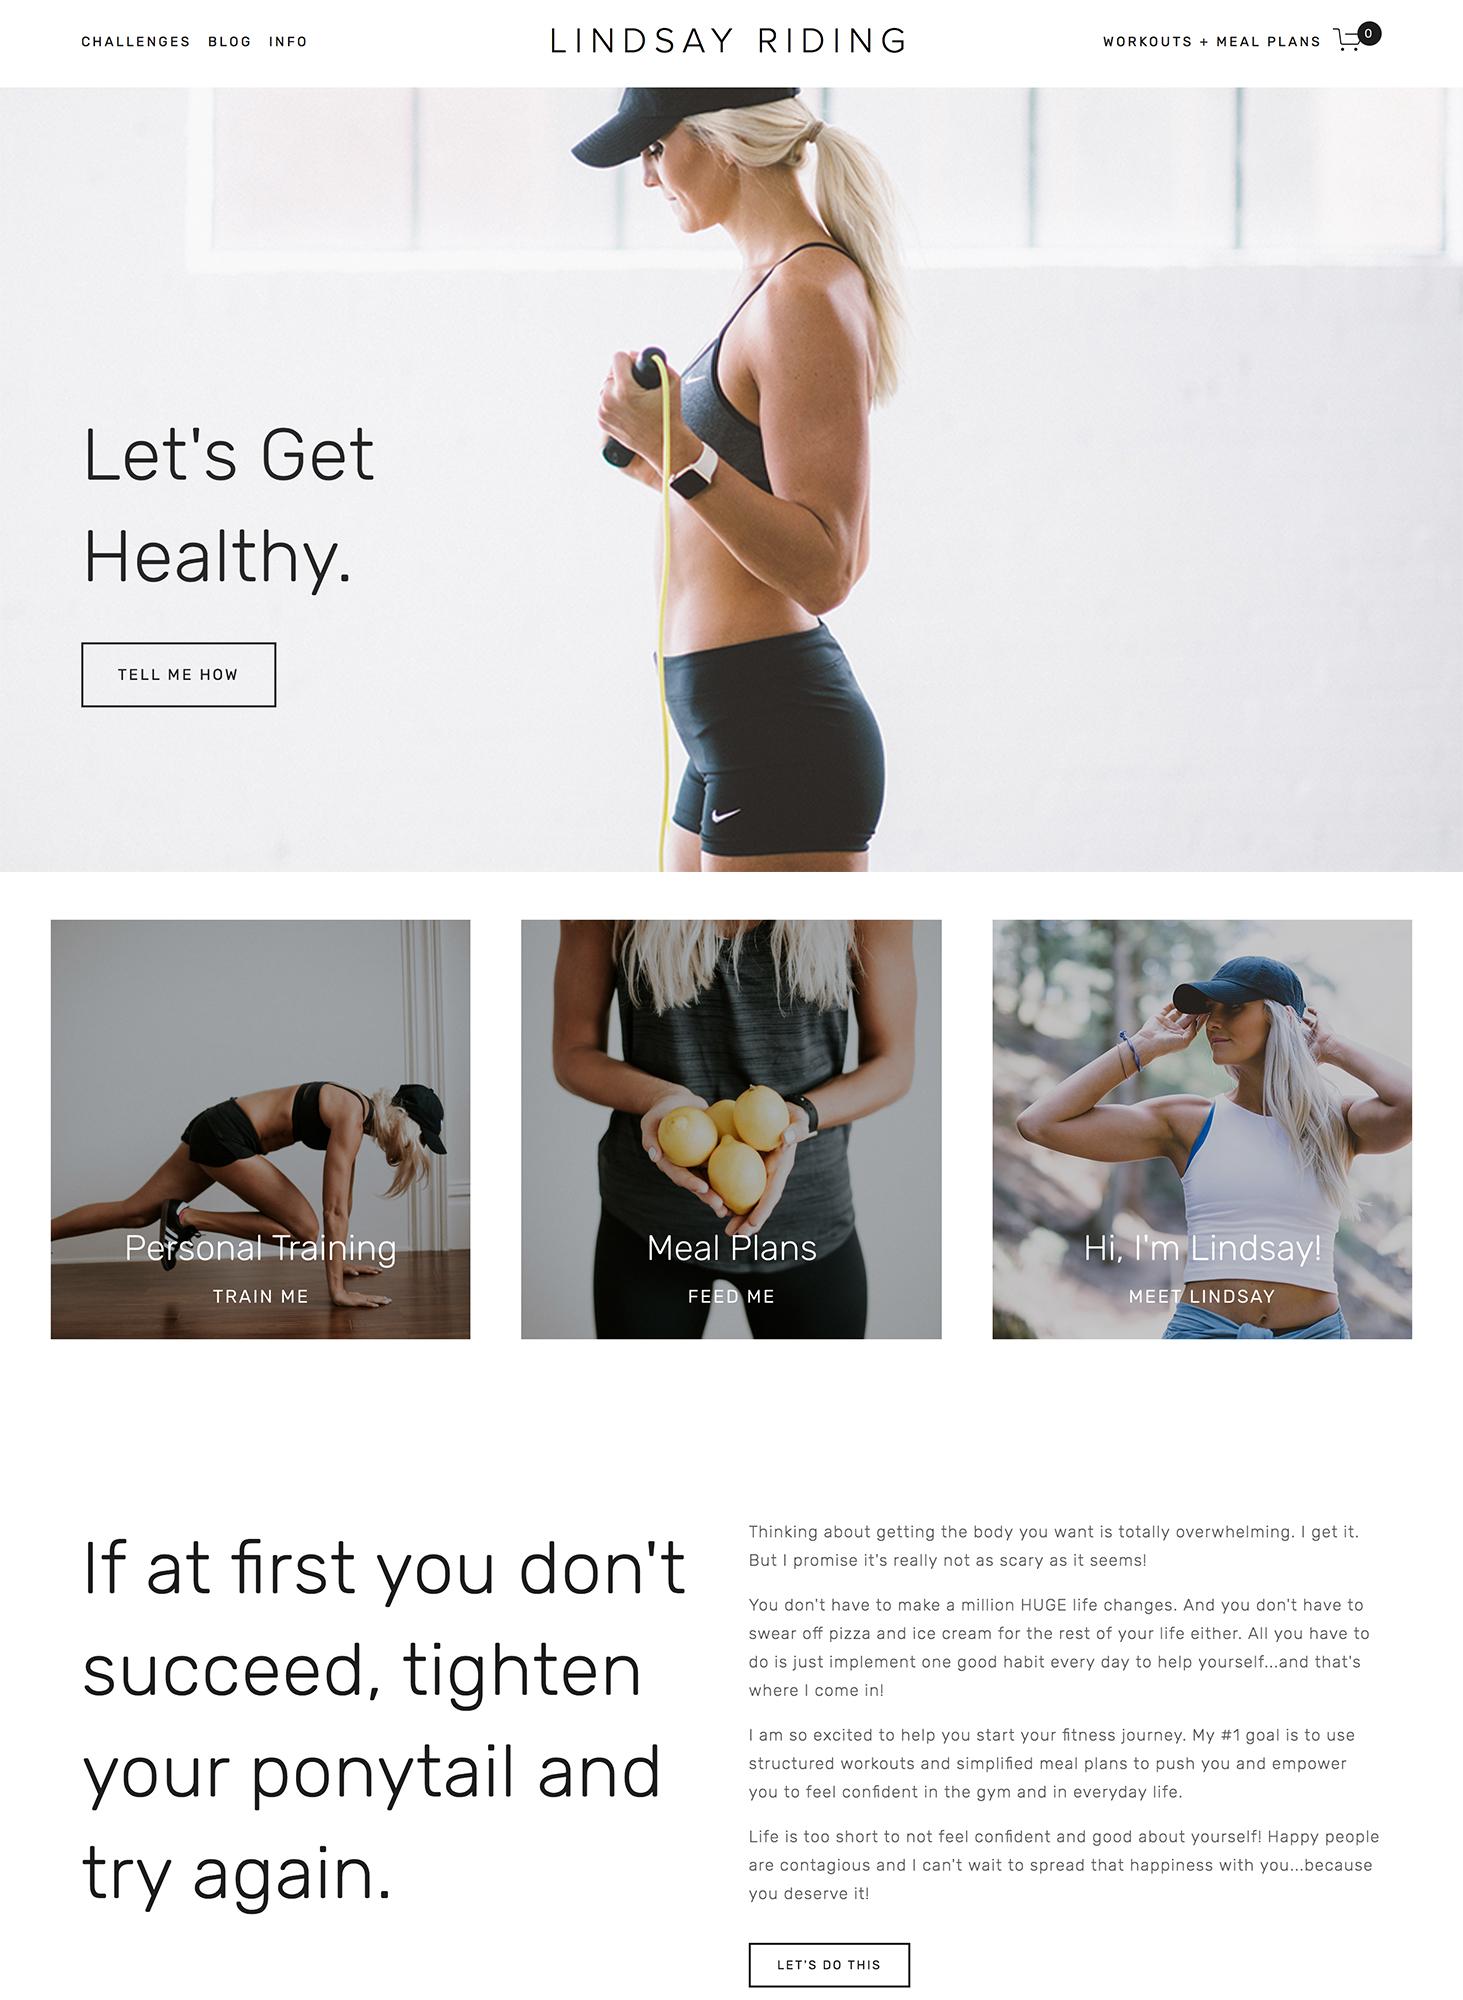 @lindsayriding - Fitness BloggerOnline Training Platform67.8k followers